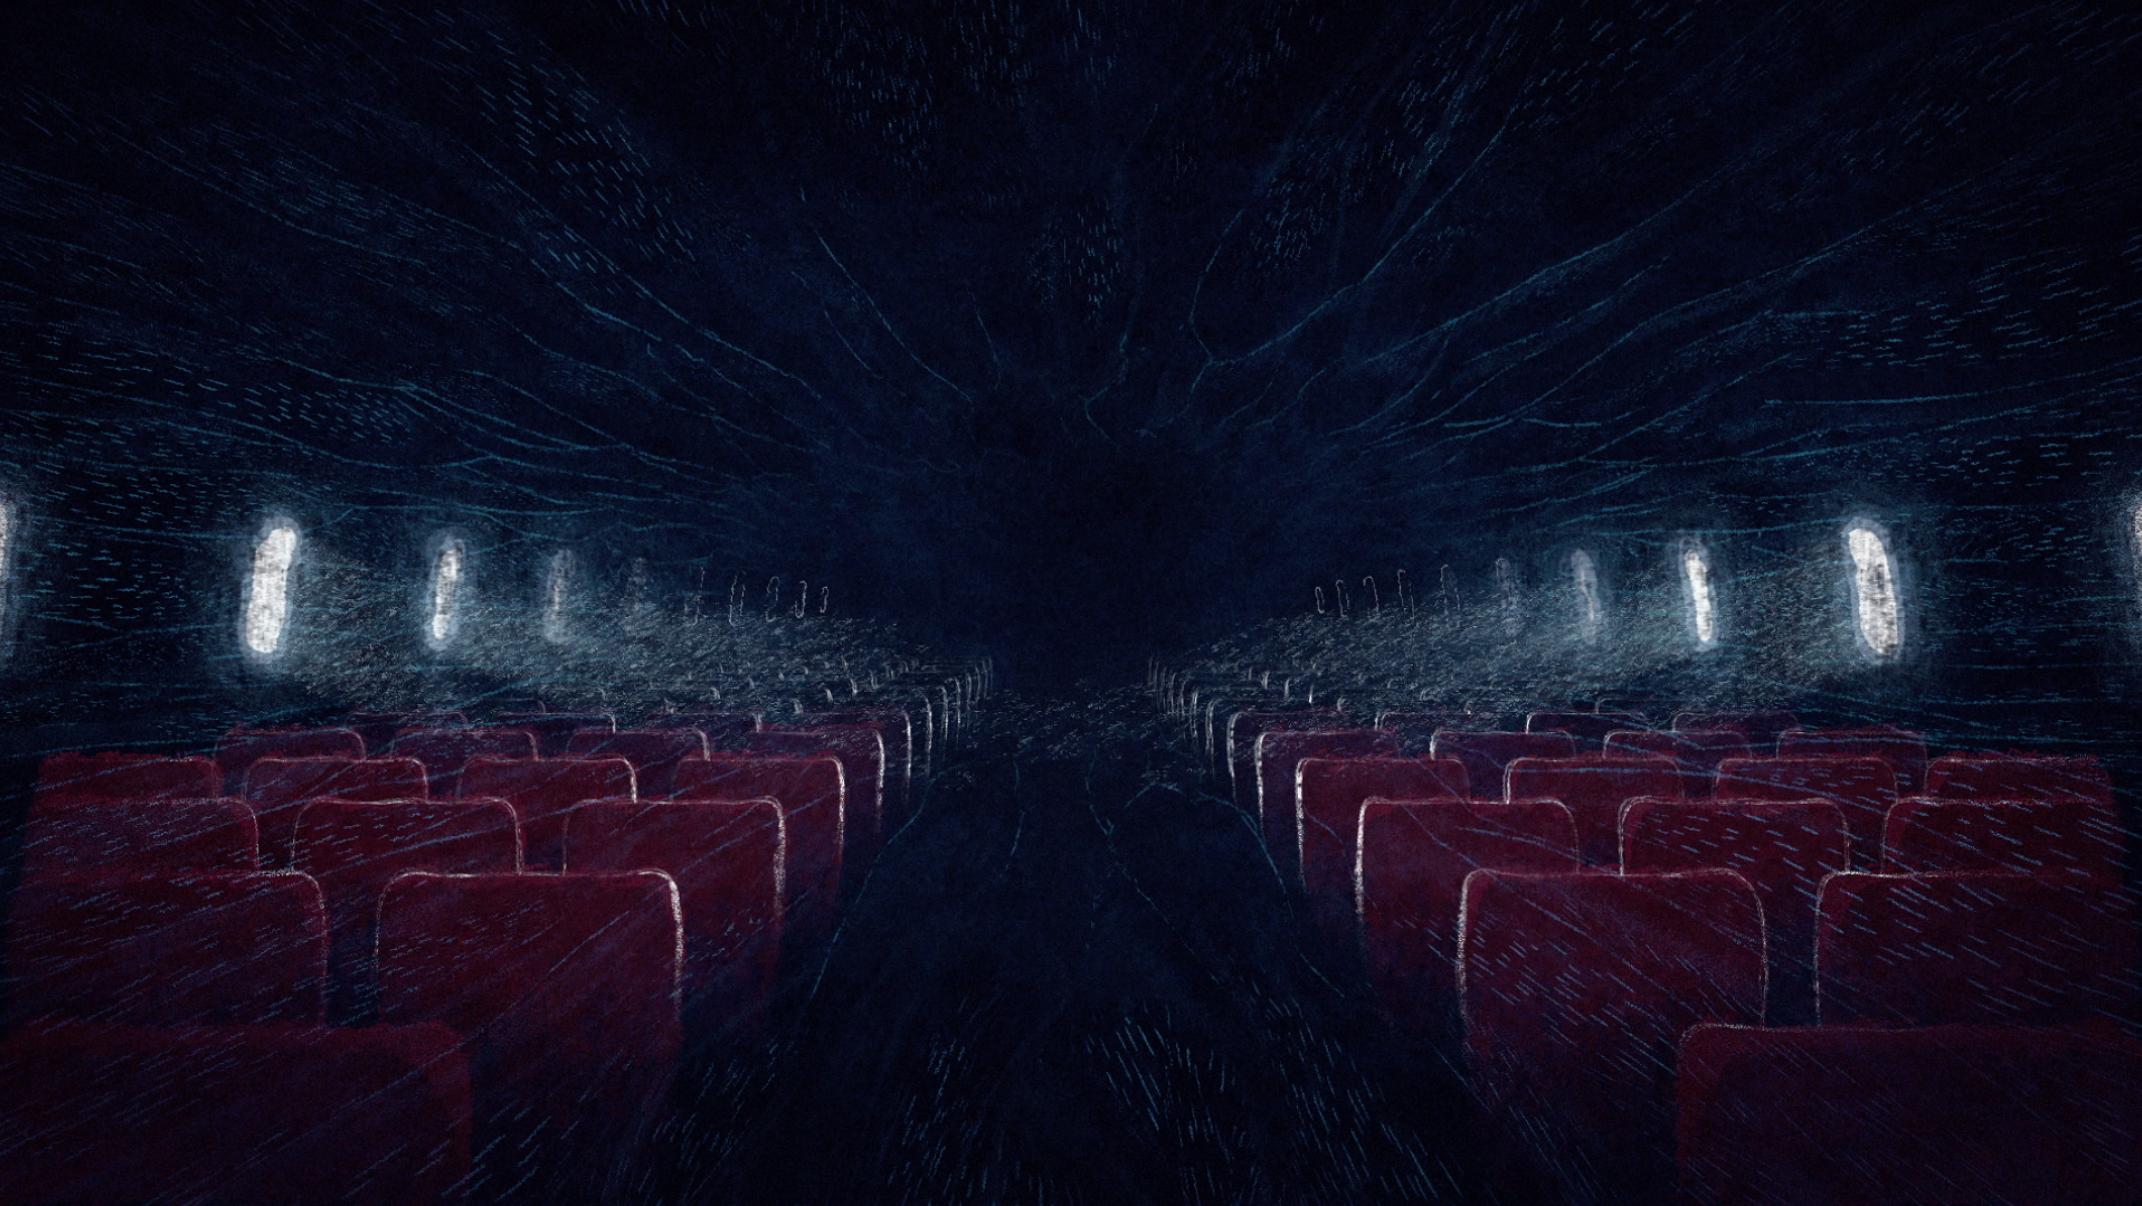 cinema seats and airplane windows for telecine promo direction beeld